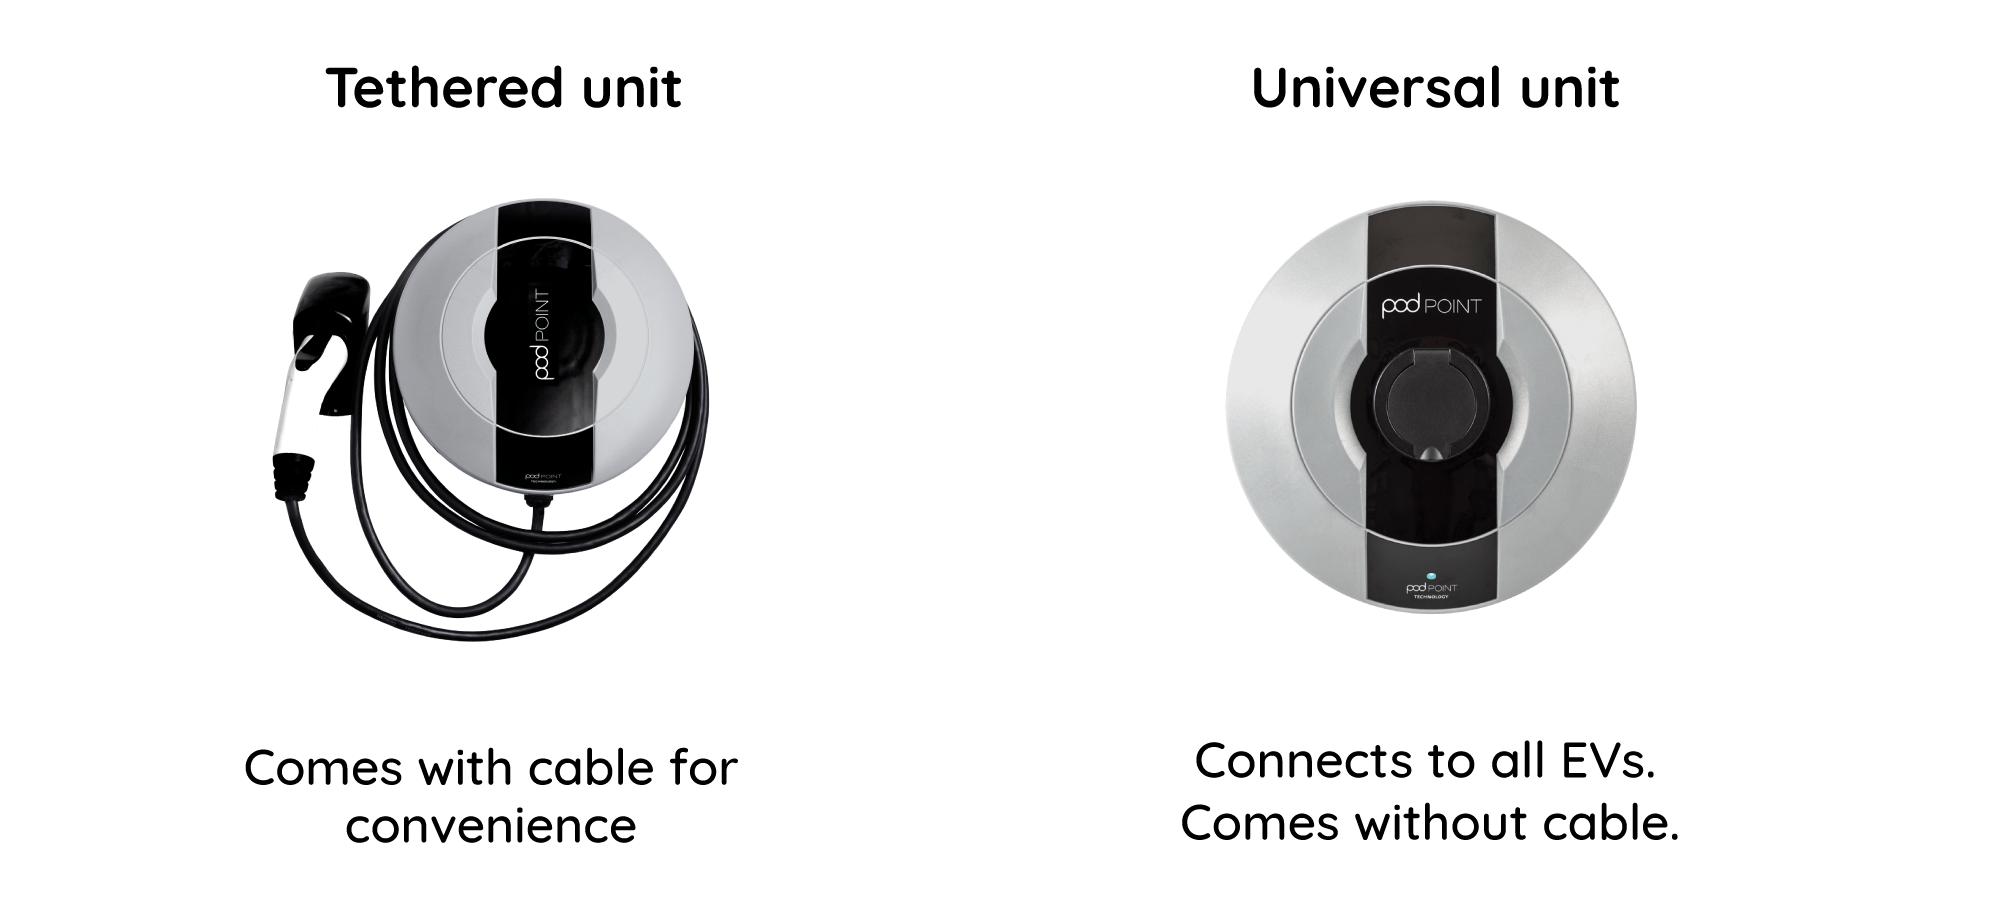 hight resolution of universal v tethered 3